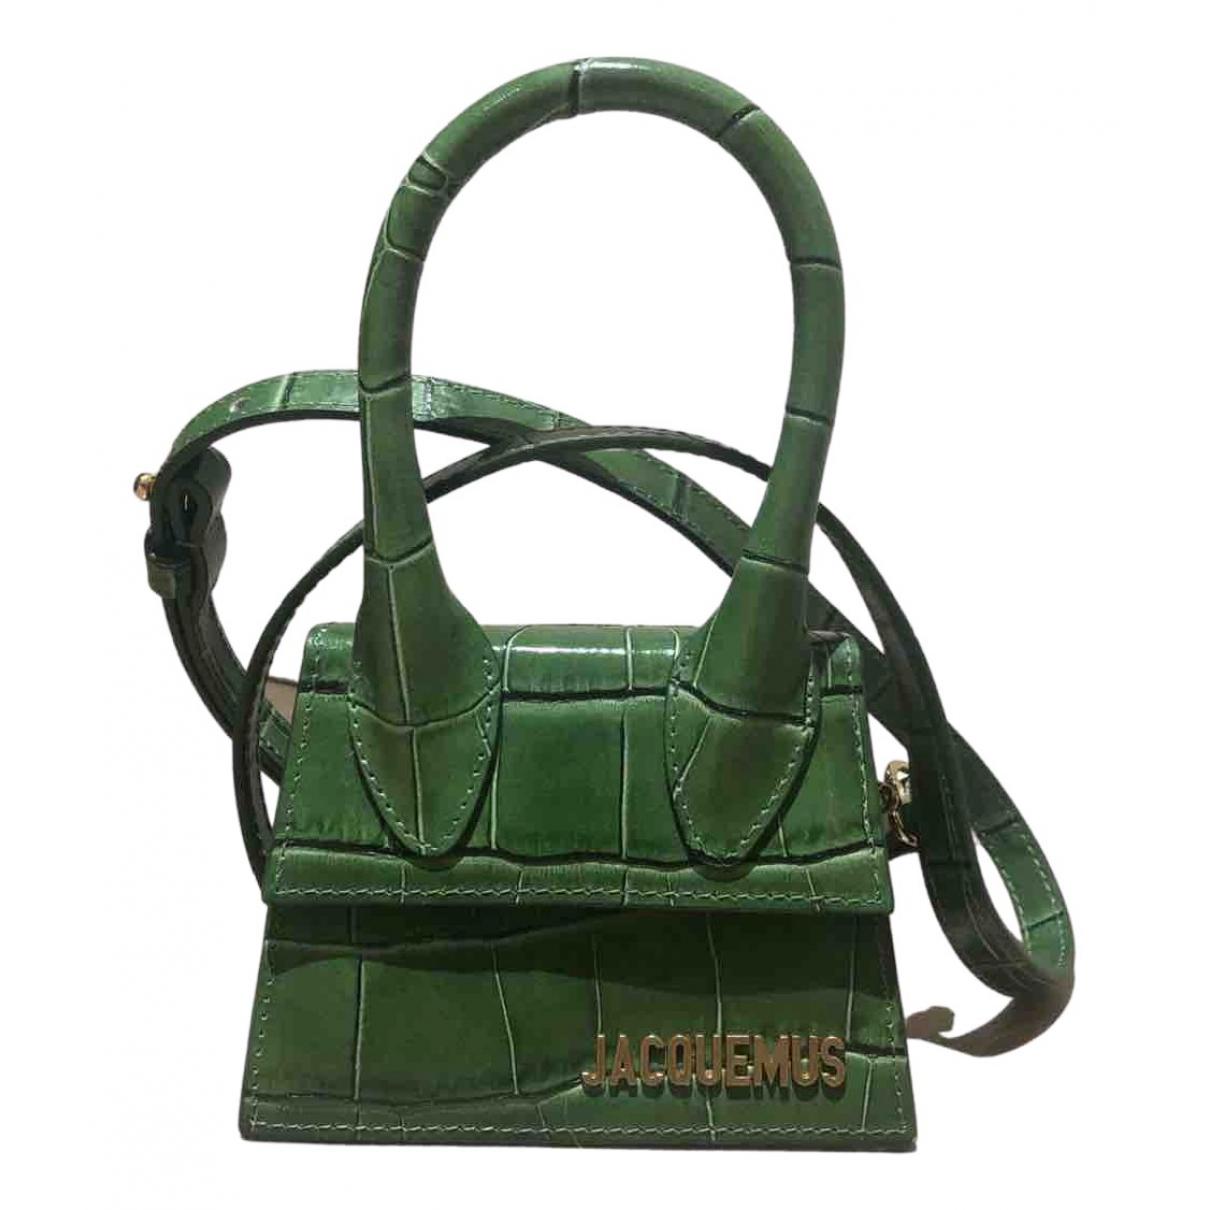 Jacquemus - Sac a main Chiquito pour femme en cuir - vert